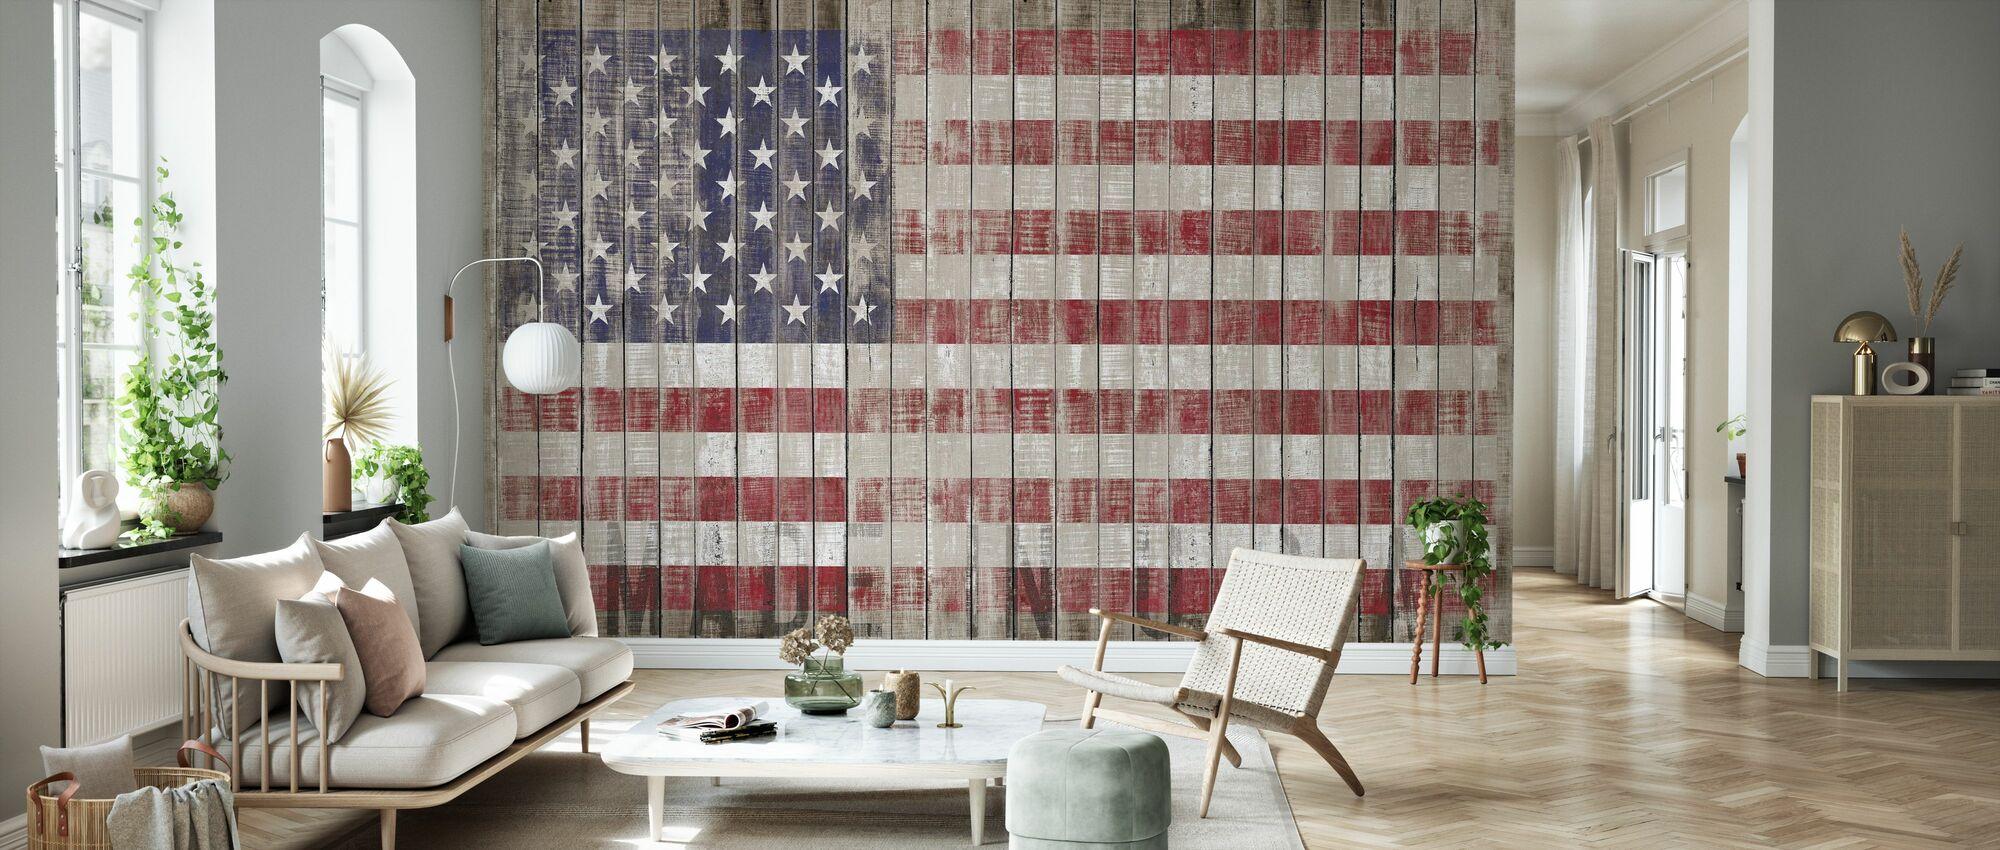 American Flag - Wallpaper - Living Room